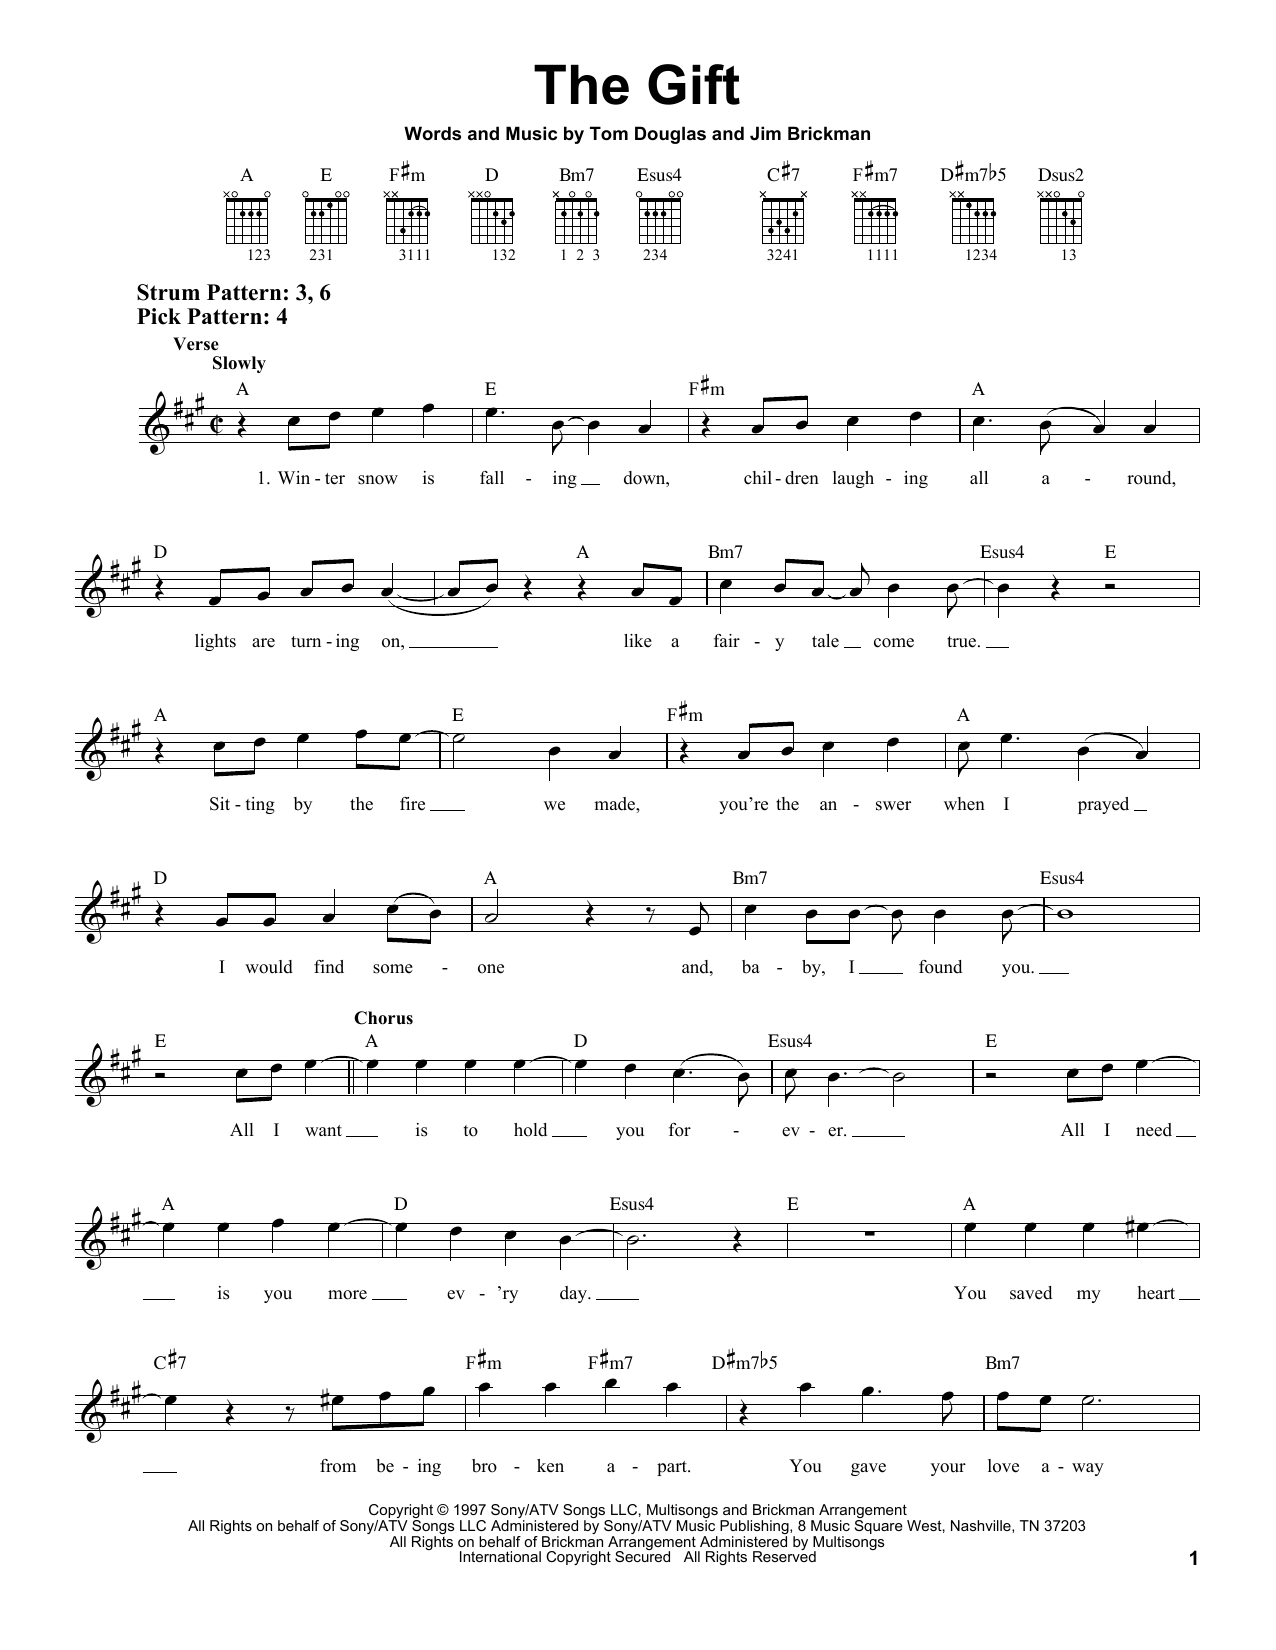 Jim Brickman The Gift sheet music notes and chords. Download Printable PDF.